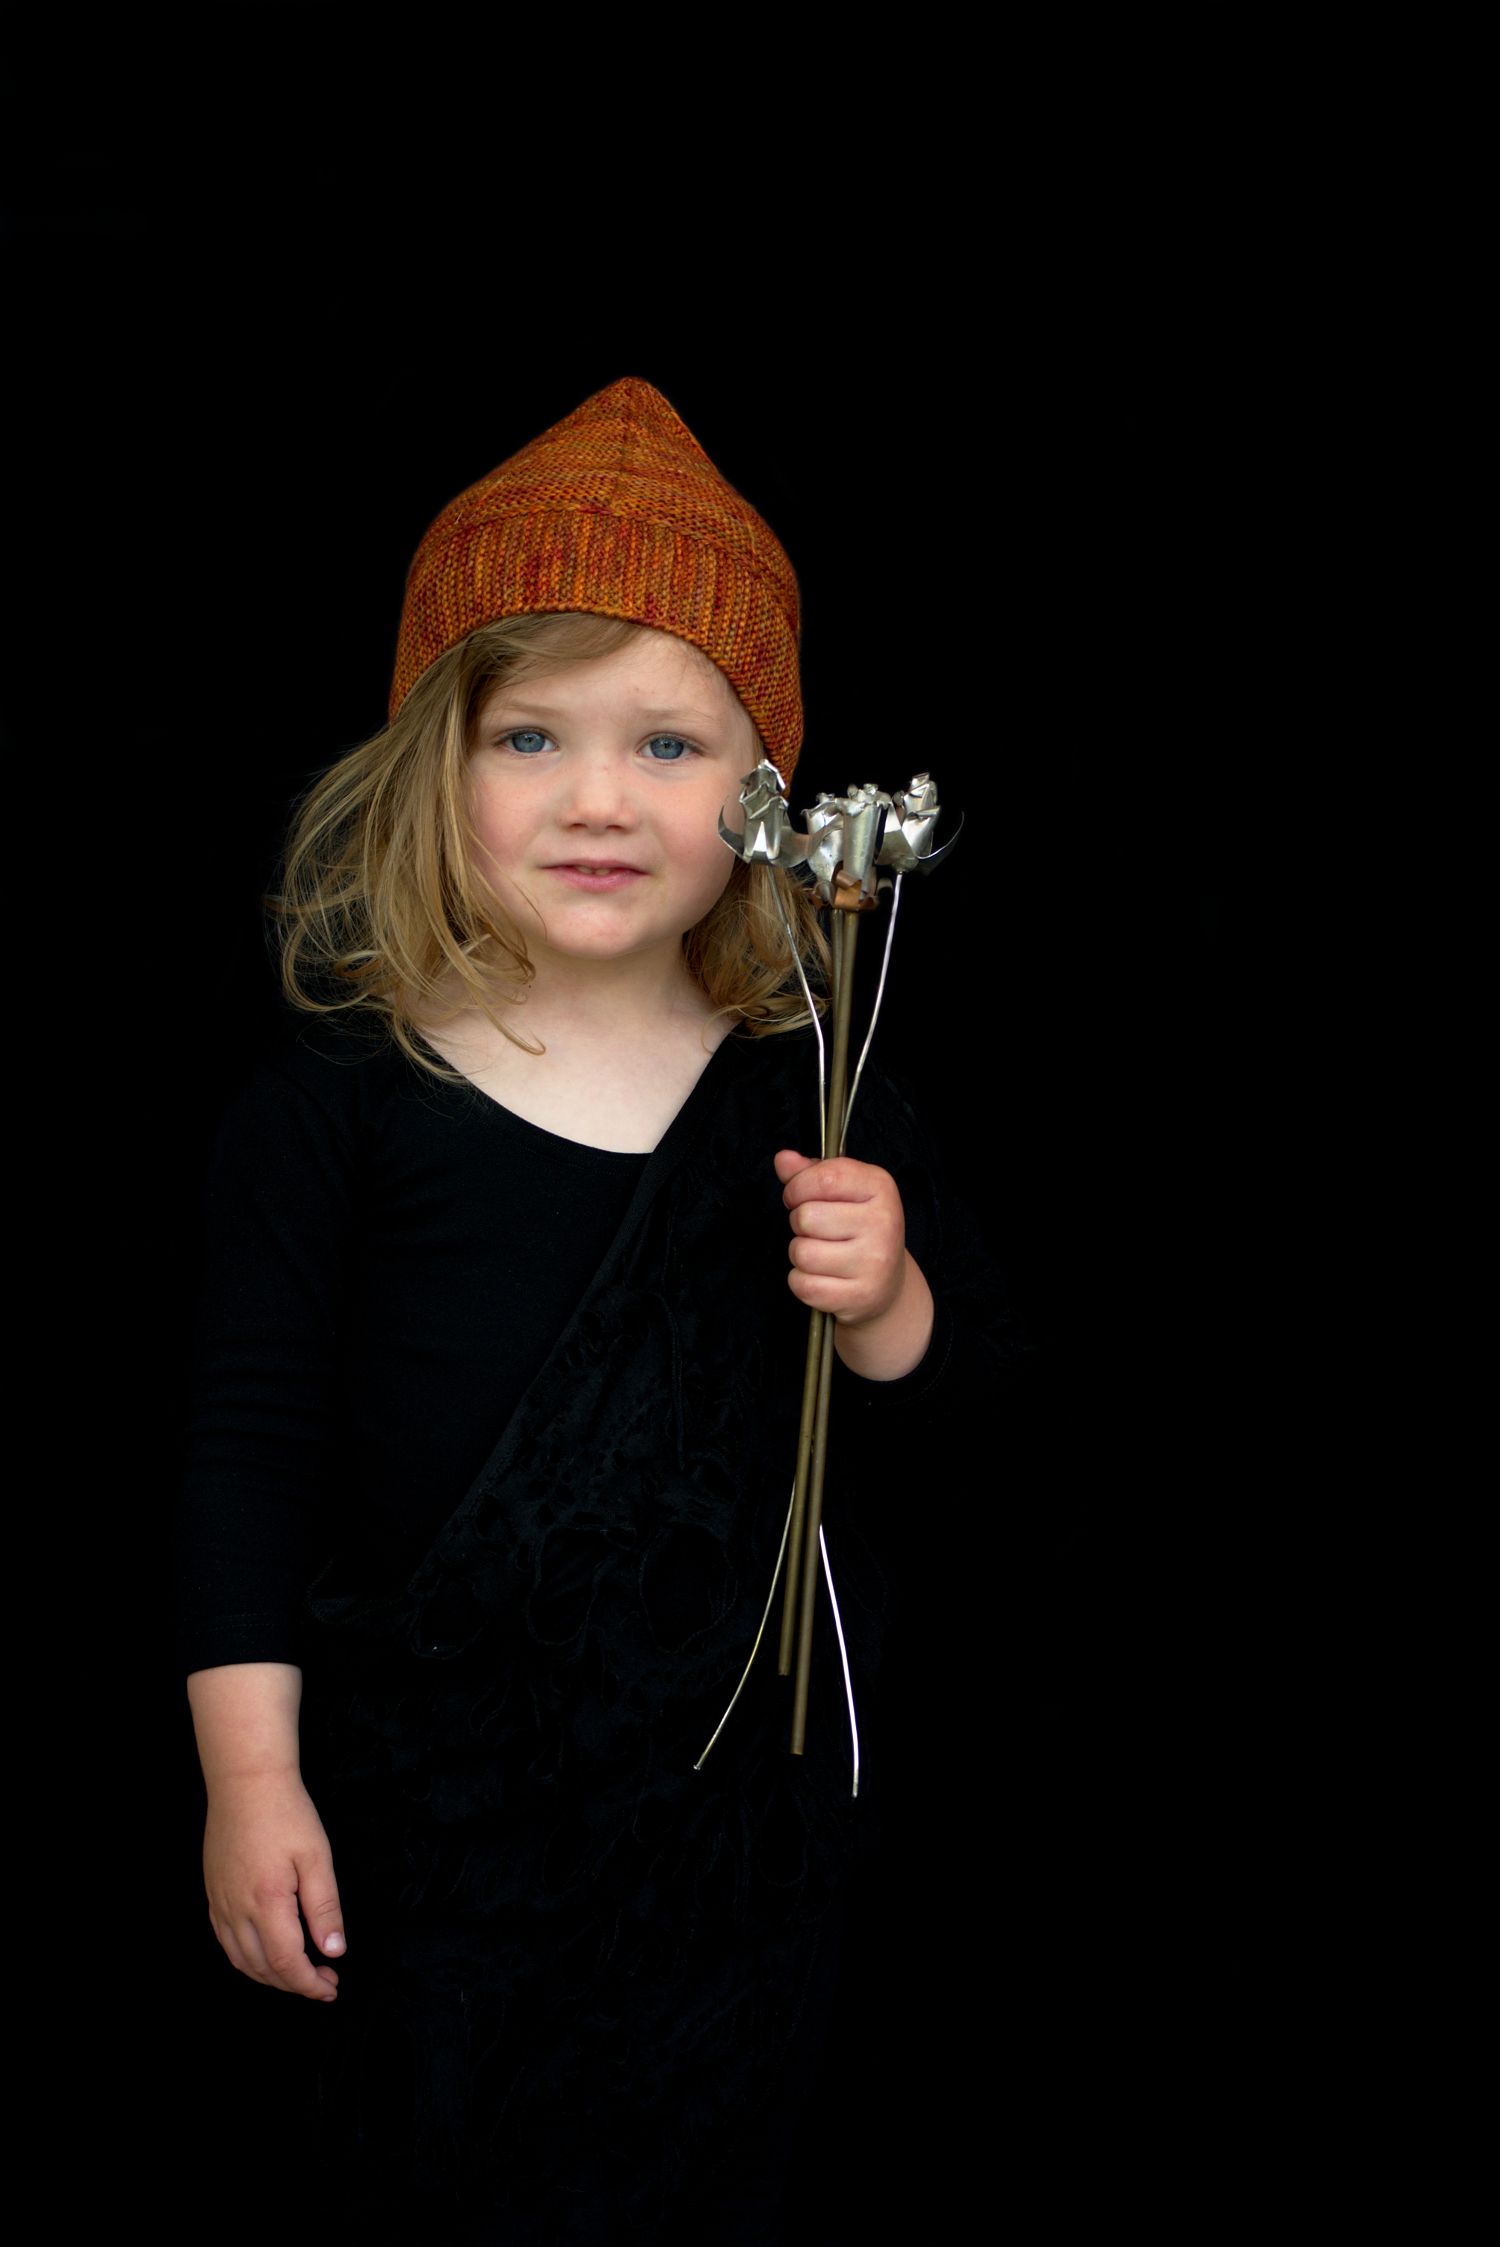 Hadleigh pixie Hat knitting pattern